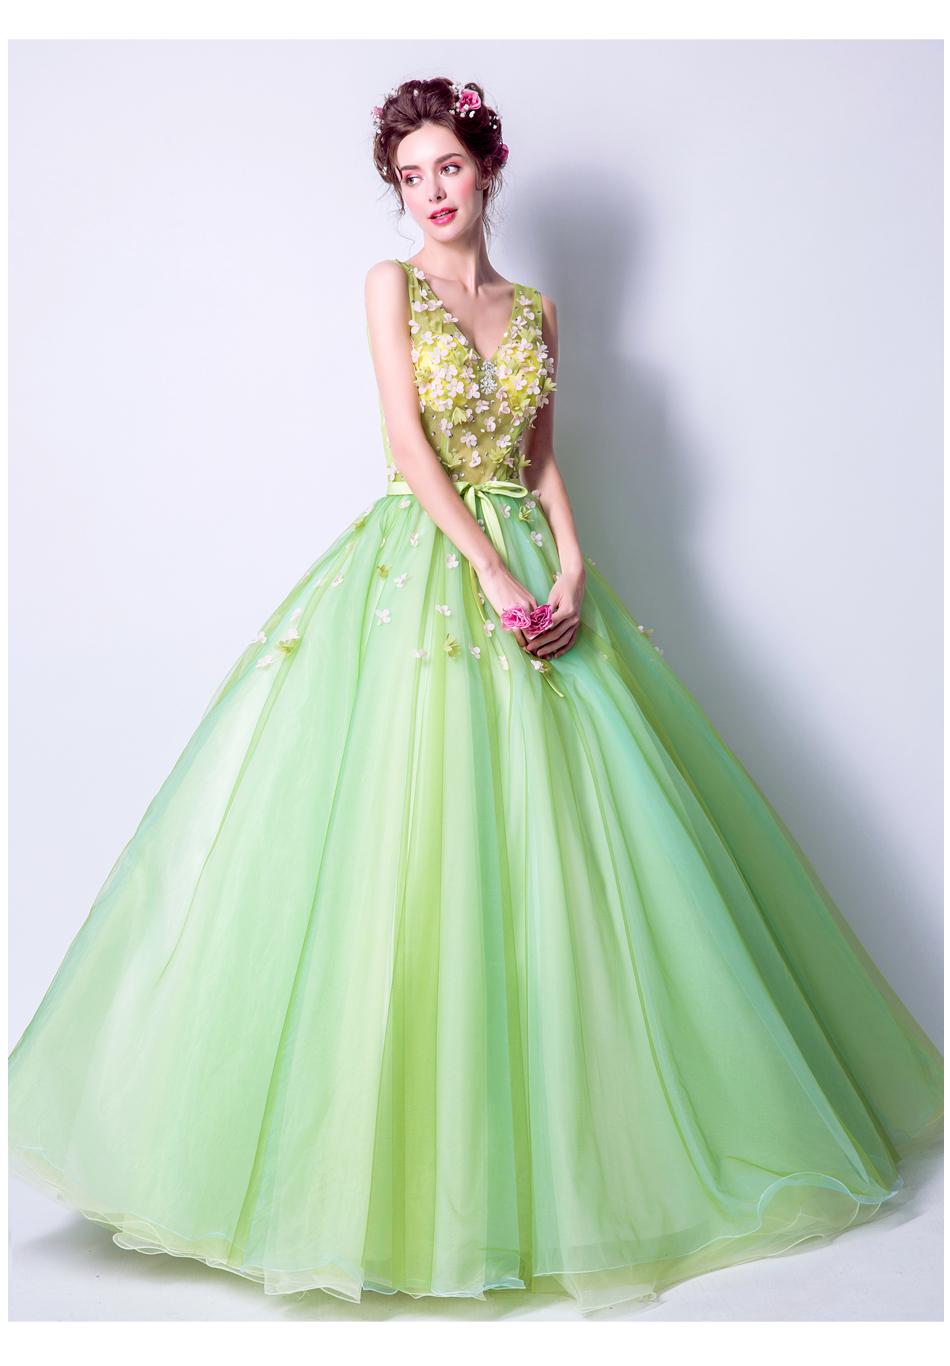 Angel Wedding Dress Marriage Bride Bridal Gown Vestido De Noiva 2017Soft powder, Qingjian Lvxian beauty, petals, green 9718 19